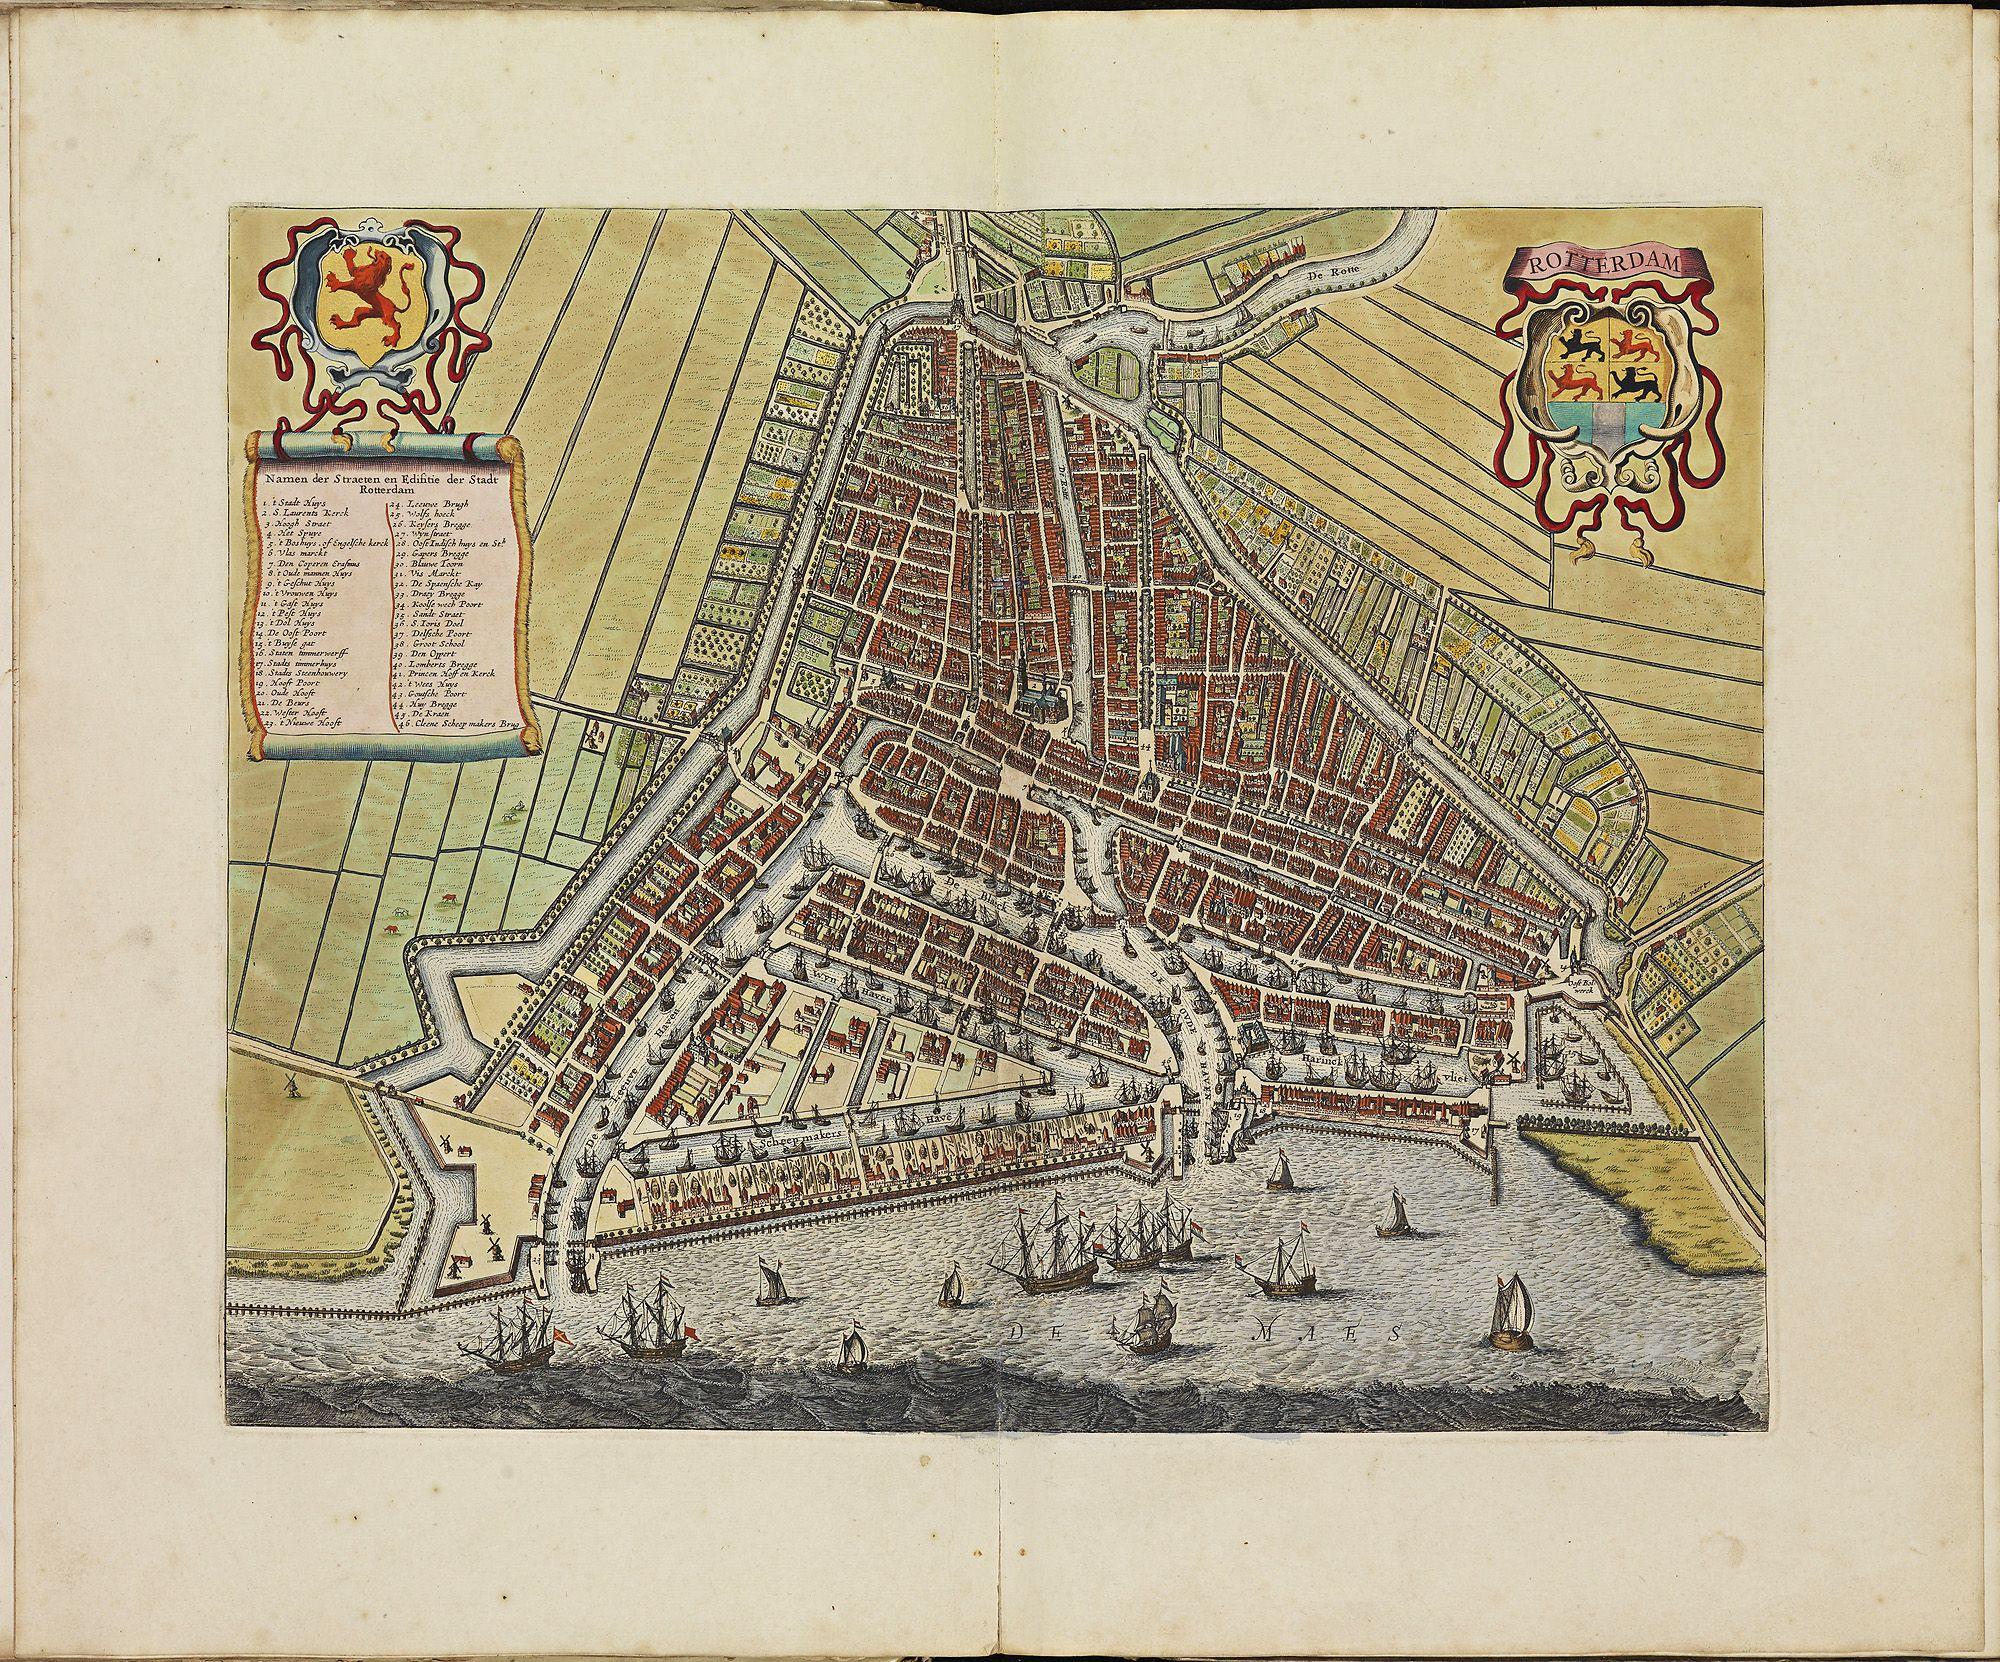 ROTTERDAM Atlas De Wit Historical MapsIllustrated MapsAntique